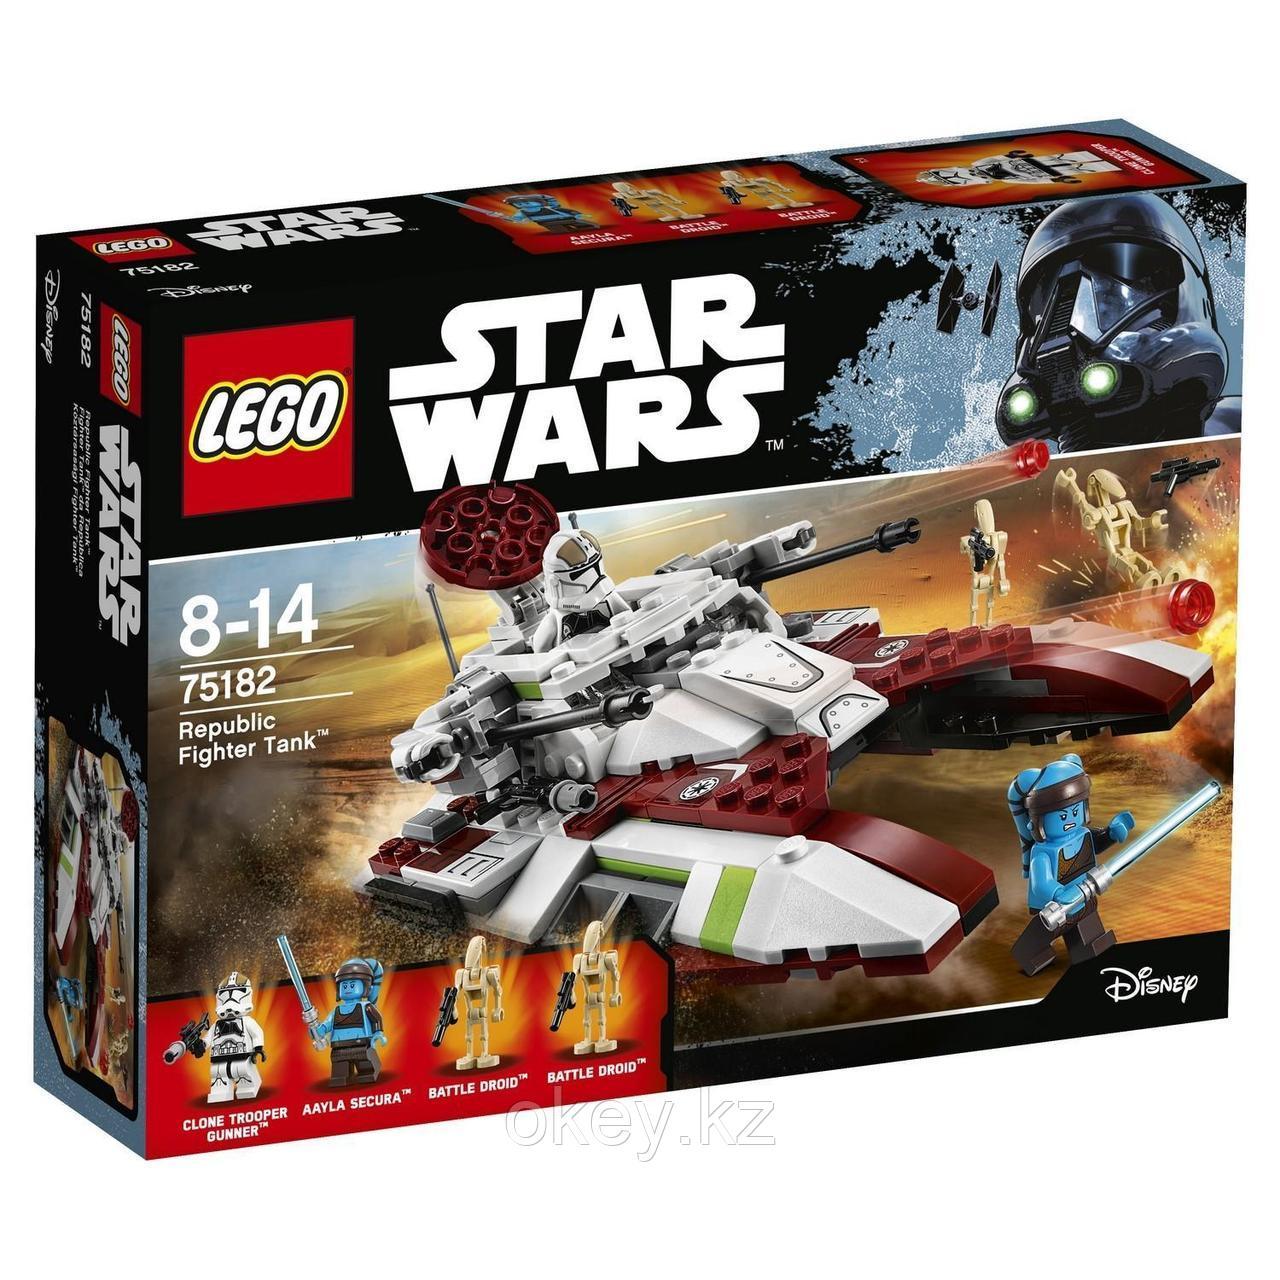 LEGO Star Wars: Боевой танк Республики 75182